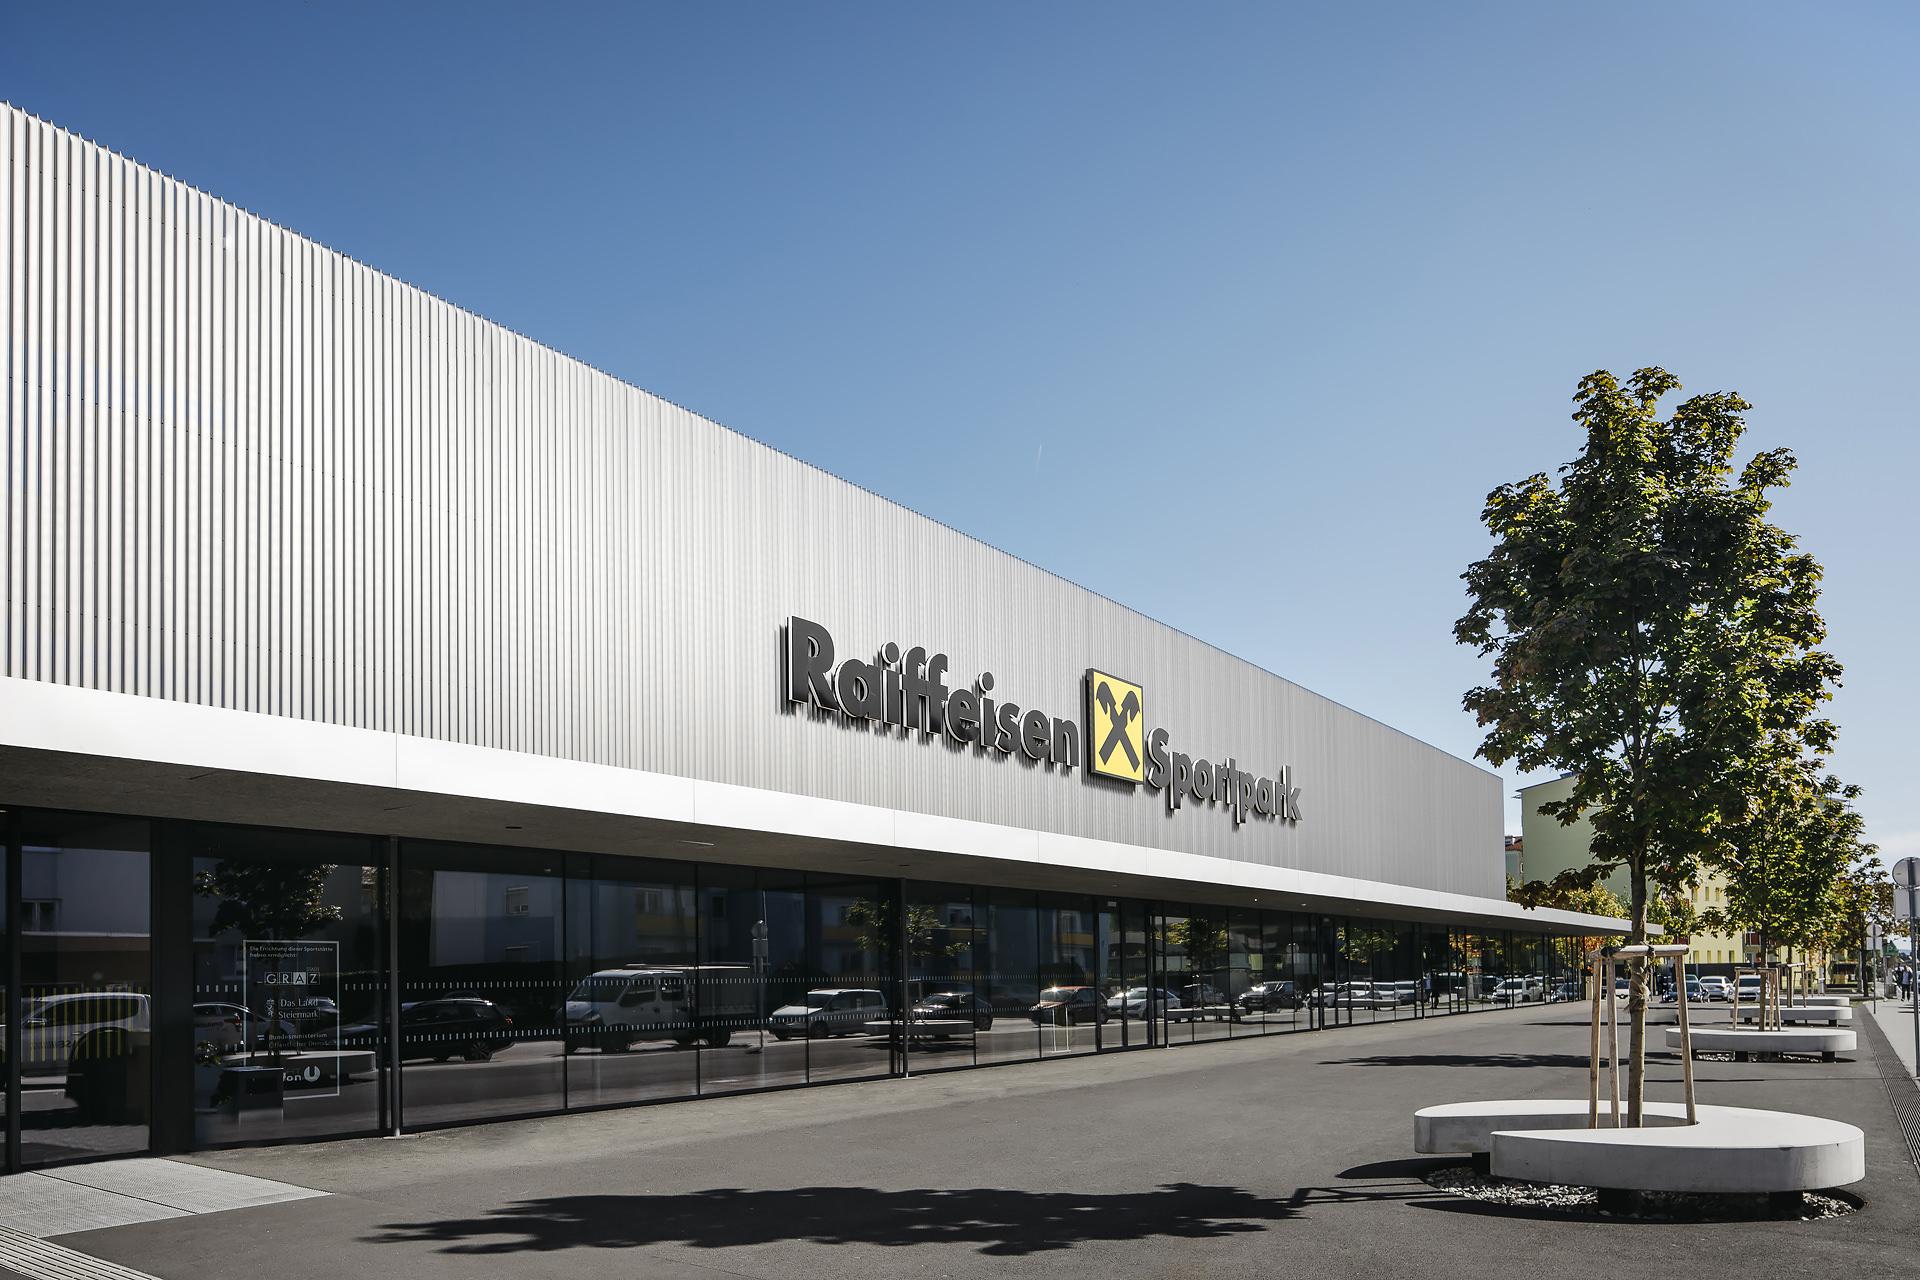 Raiffeisen-sport-park-1